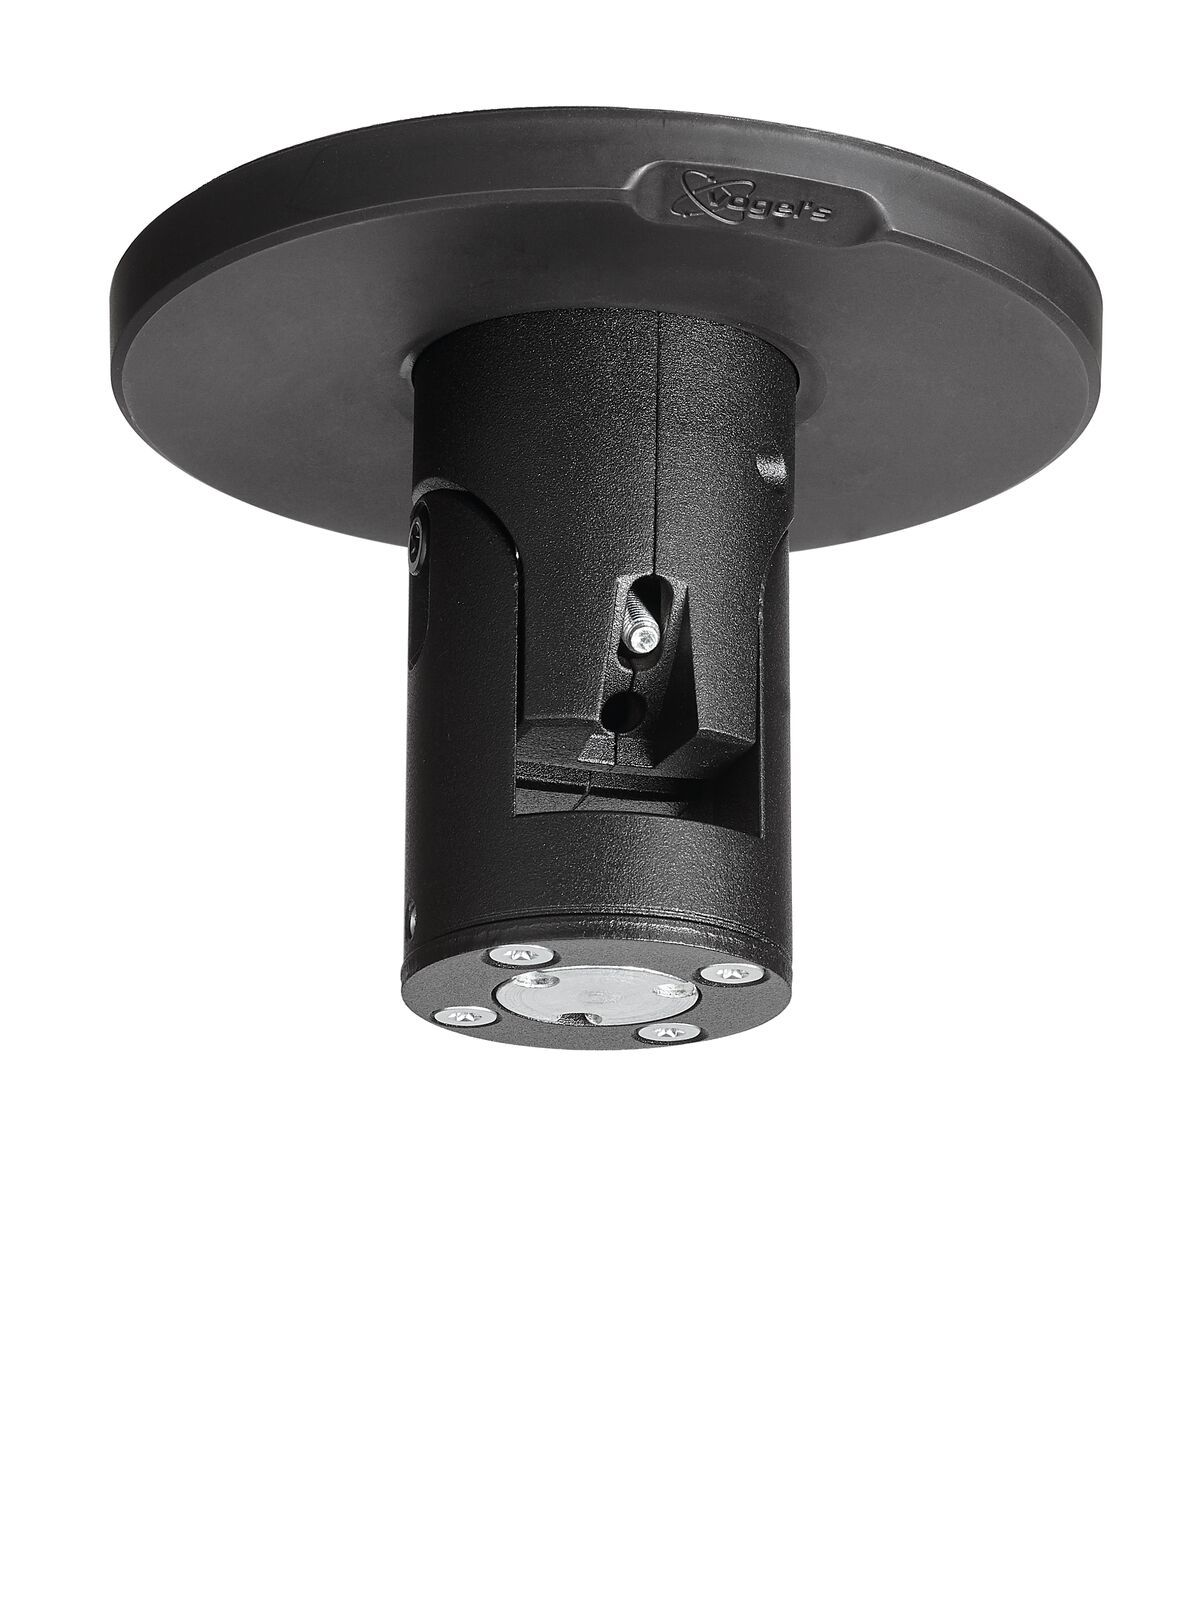 Vogel's PUC 1045 Plafondplaat kantelbaar/draaibaar - Product